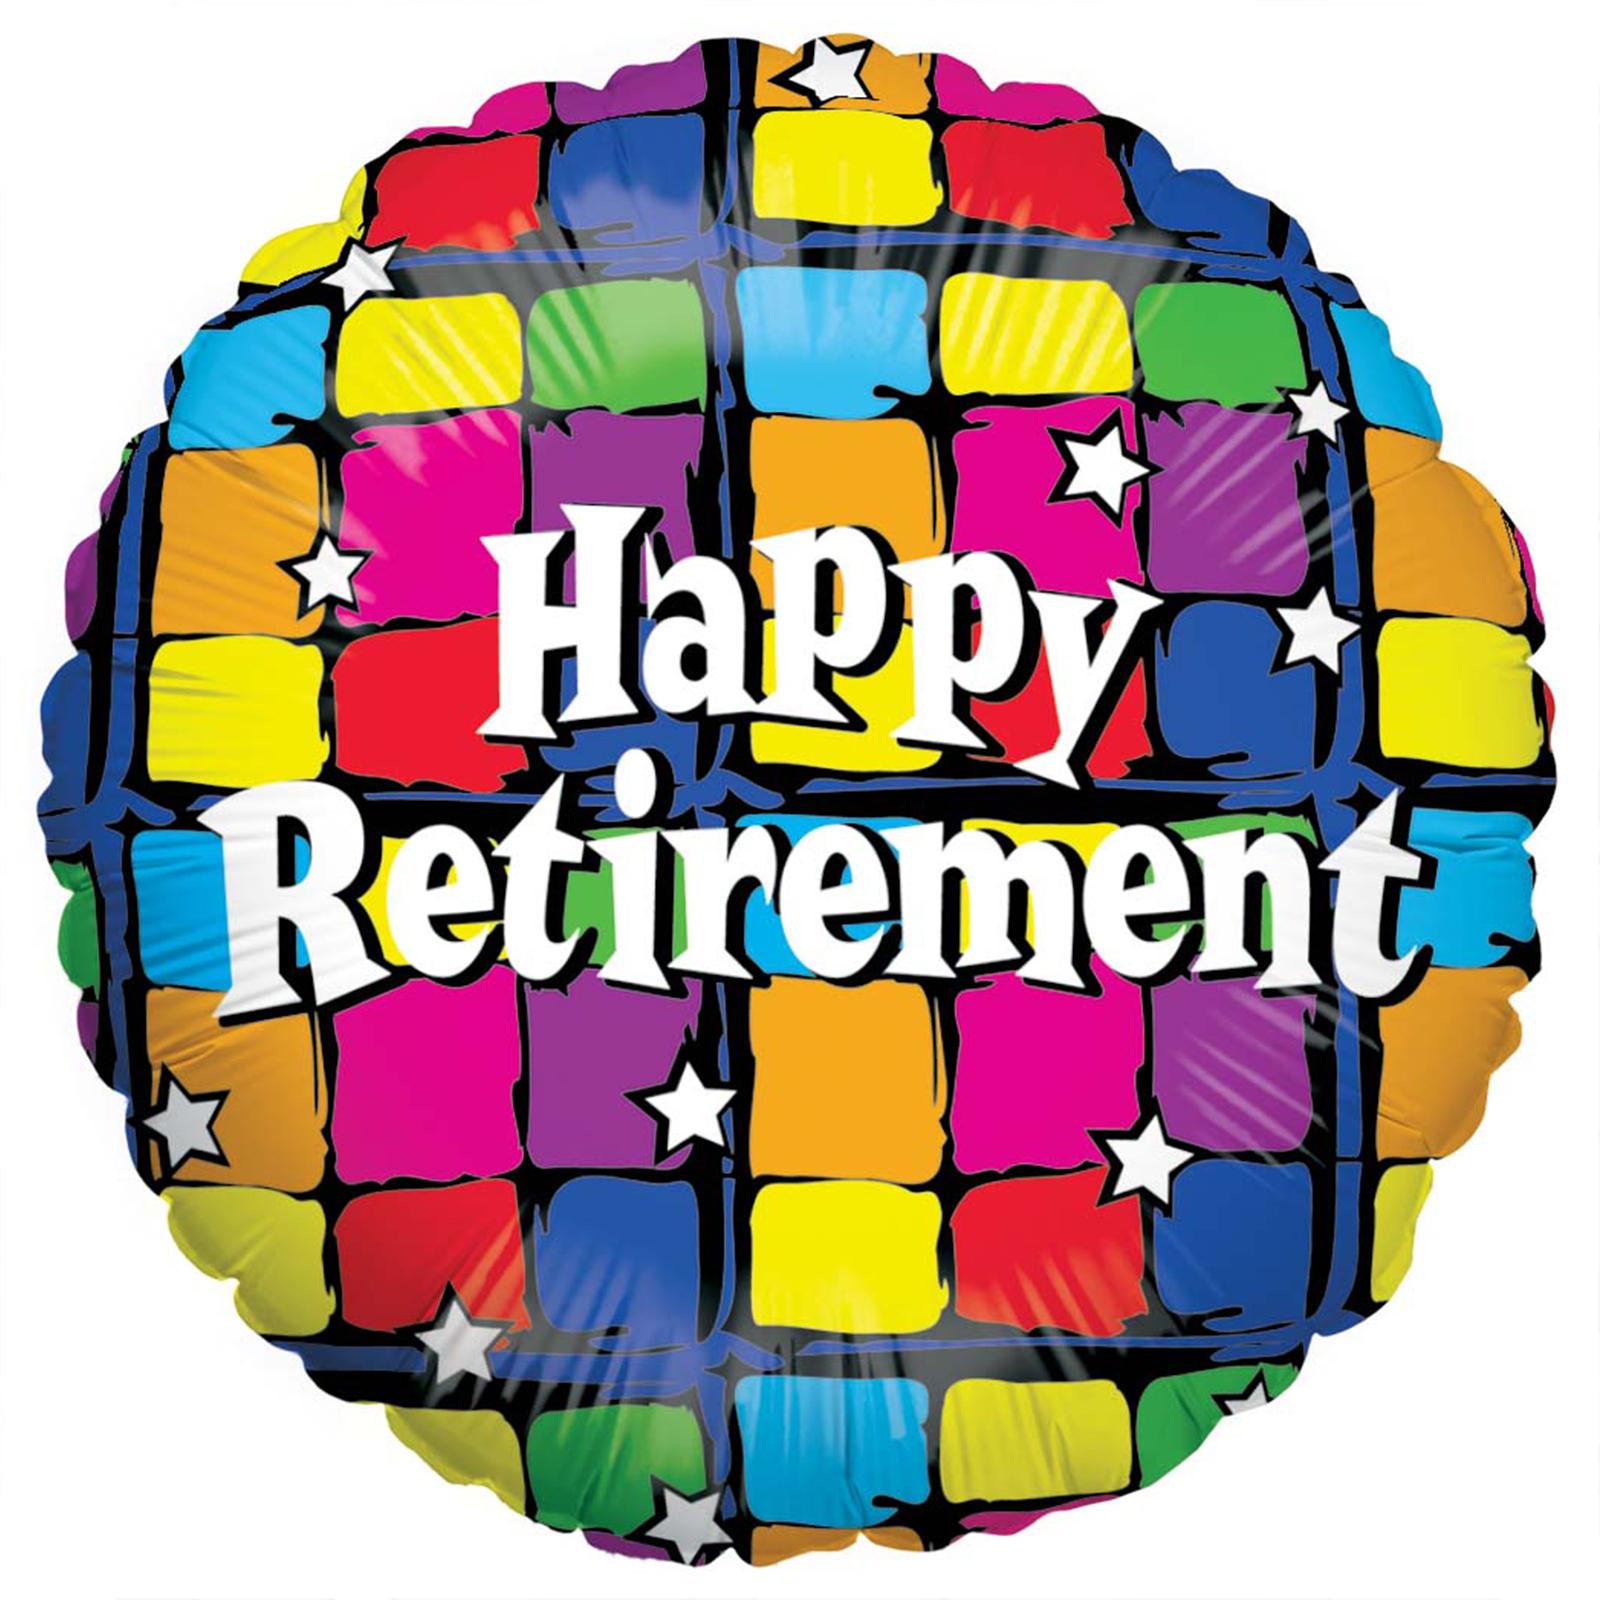 clip art images for retirement - photo #43